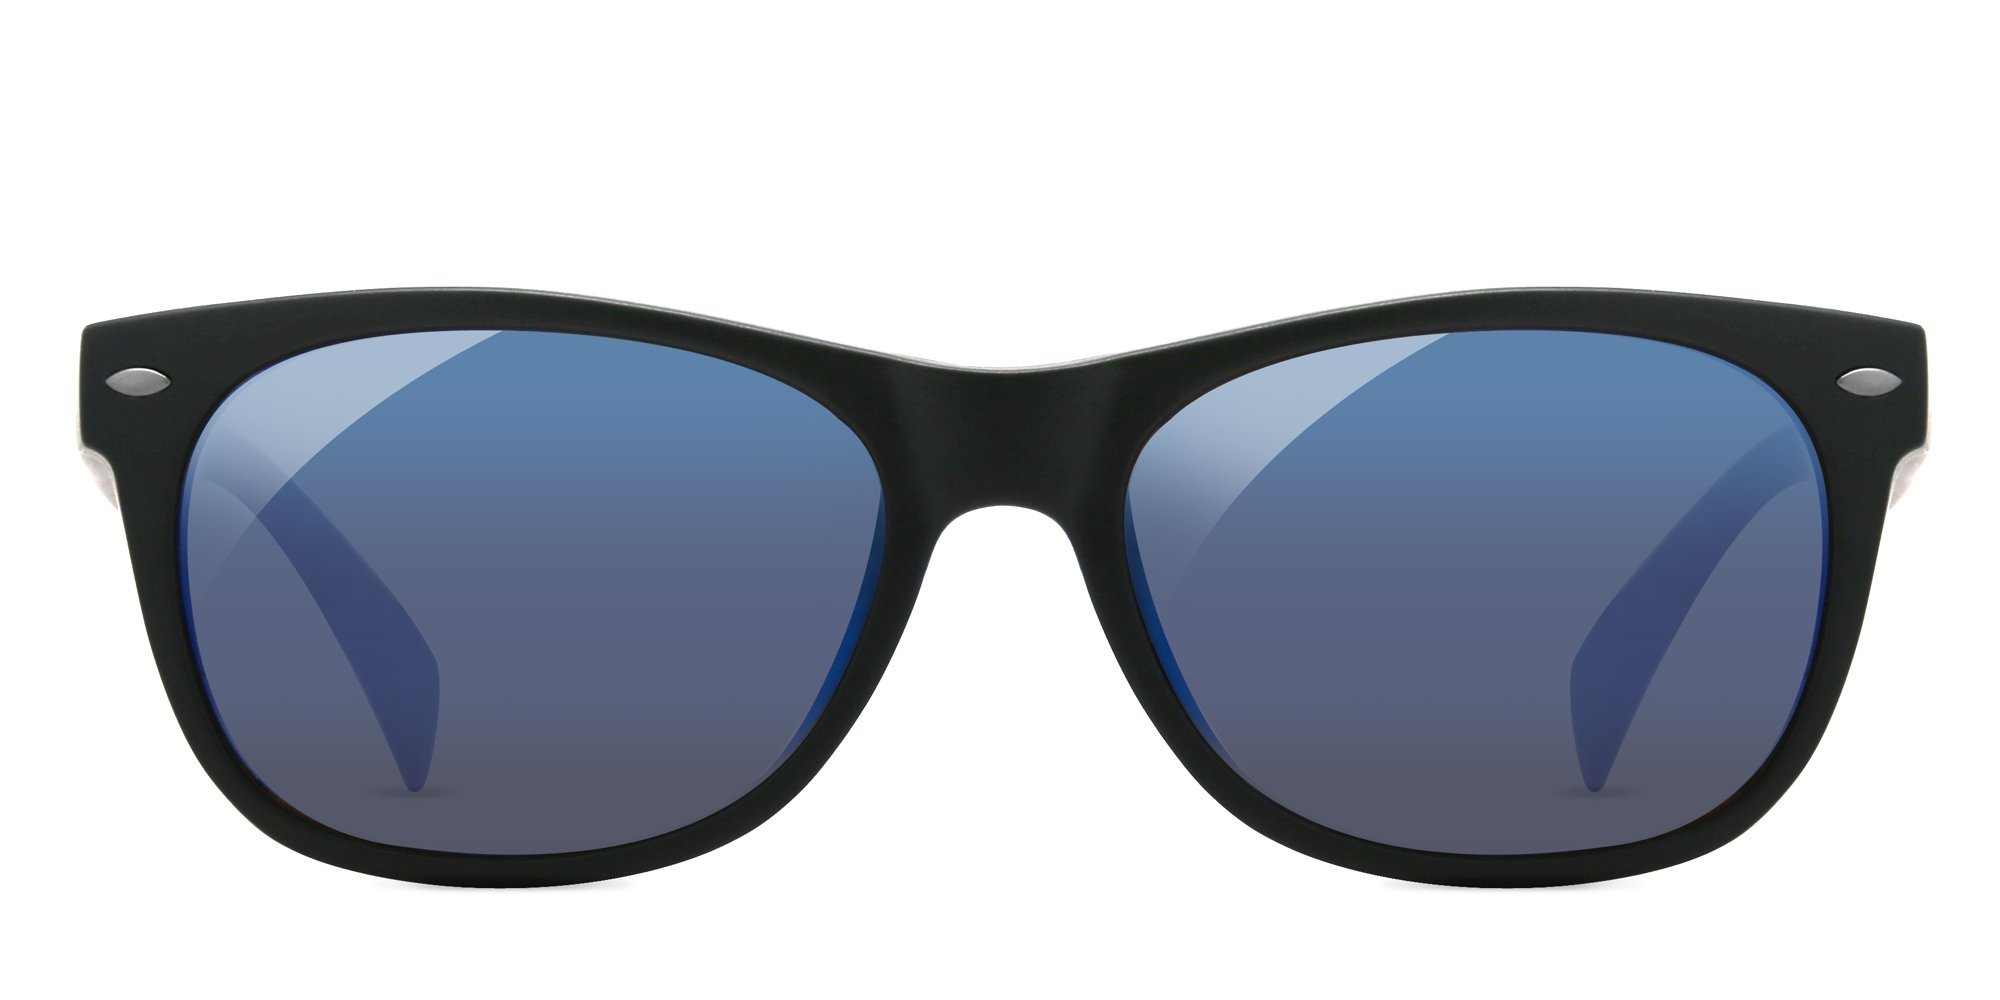 Enchroma Ellis - Color Blind Glasses (Black, Enchroma sunglass with blue anti-reflective coating)